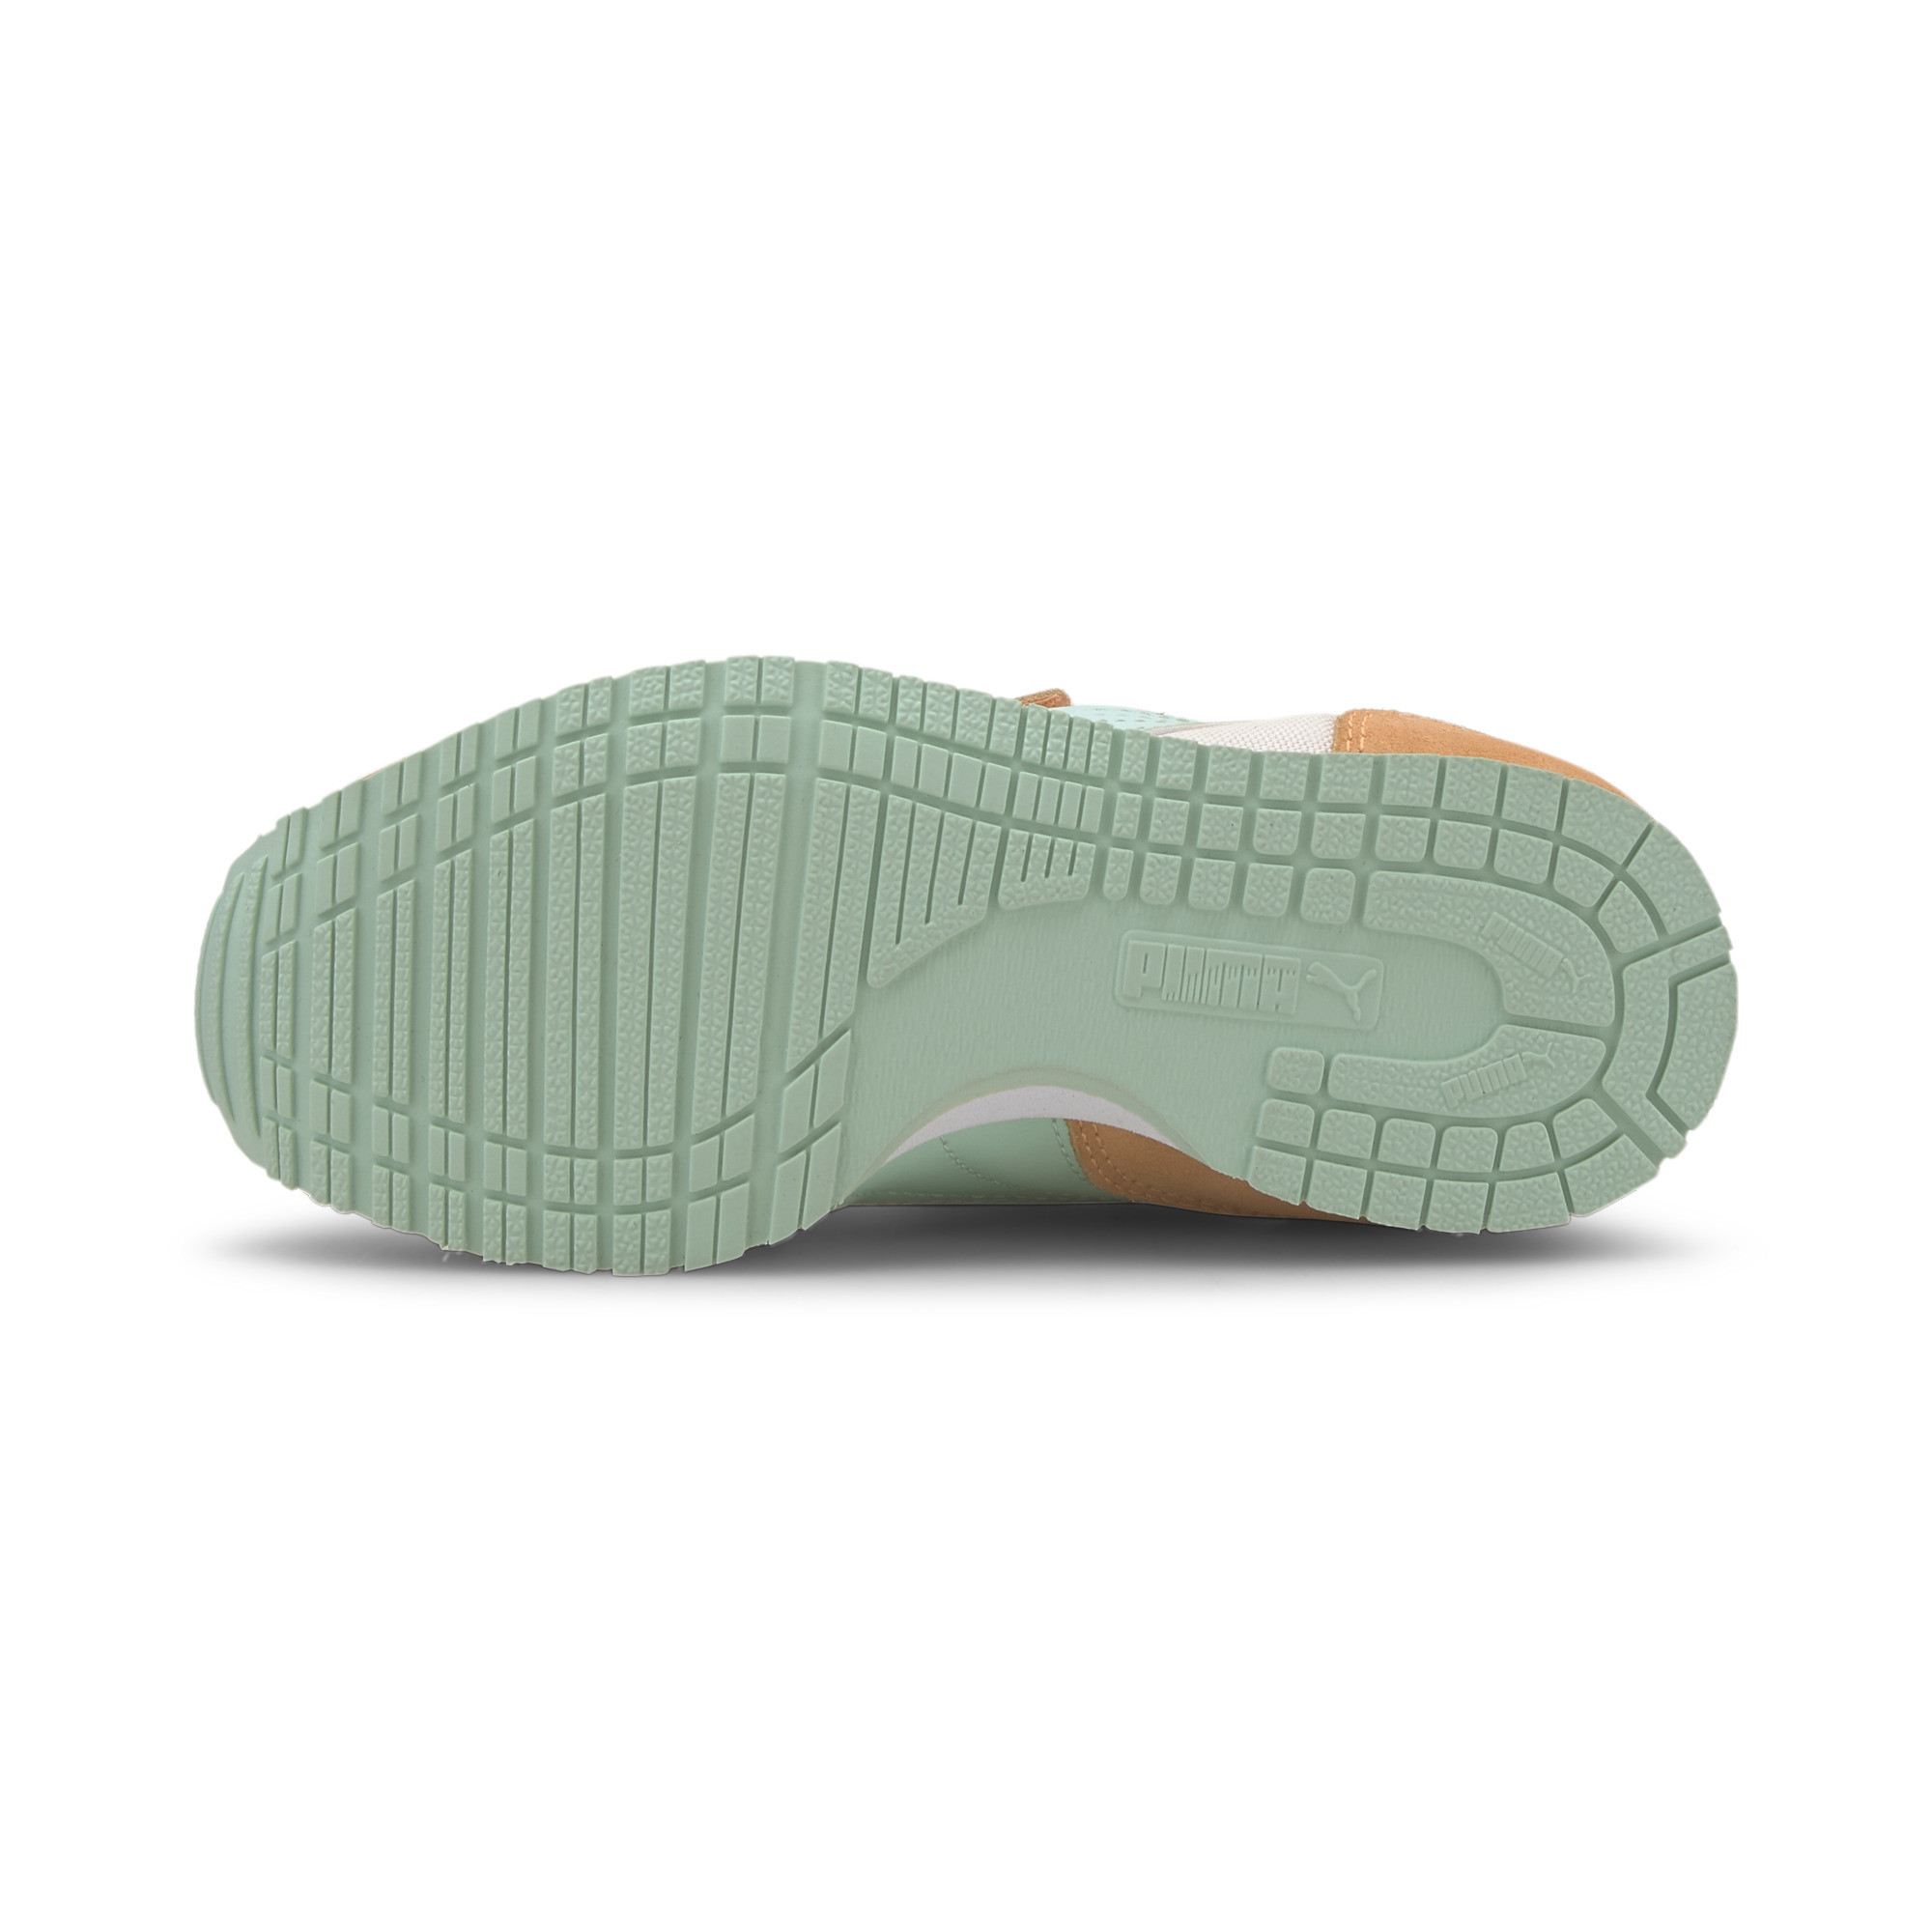 PUMA-Cabana-Racer-Little-Kids-039-Shoes-Kids-Shoe-Kids thumbnail 22